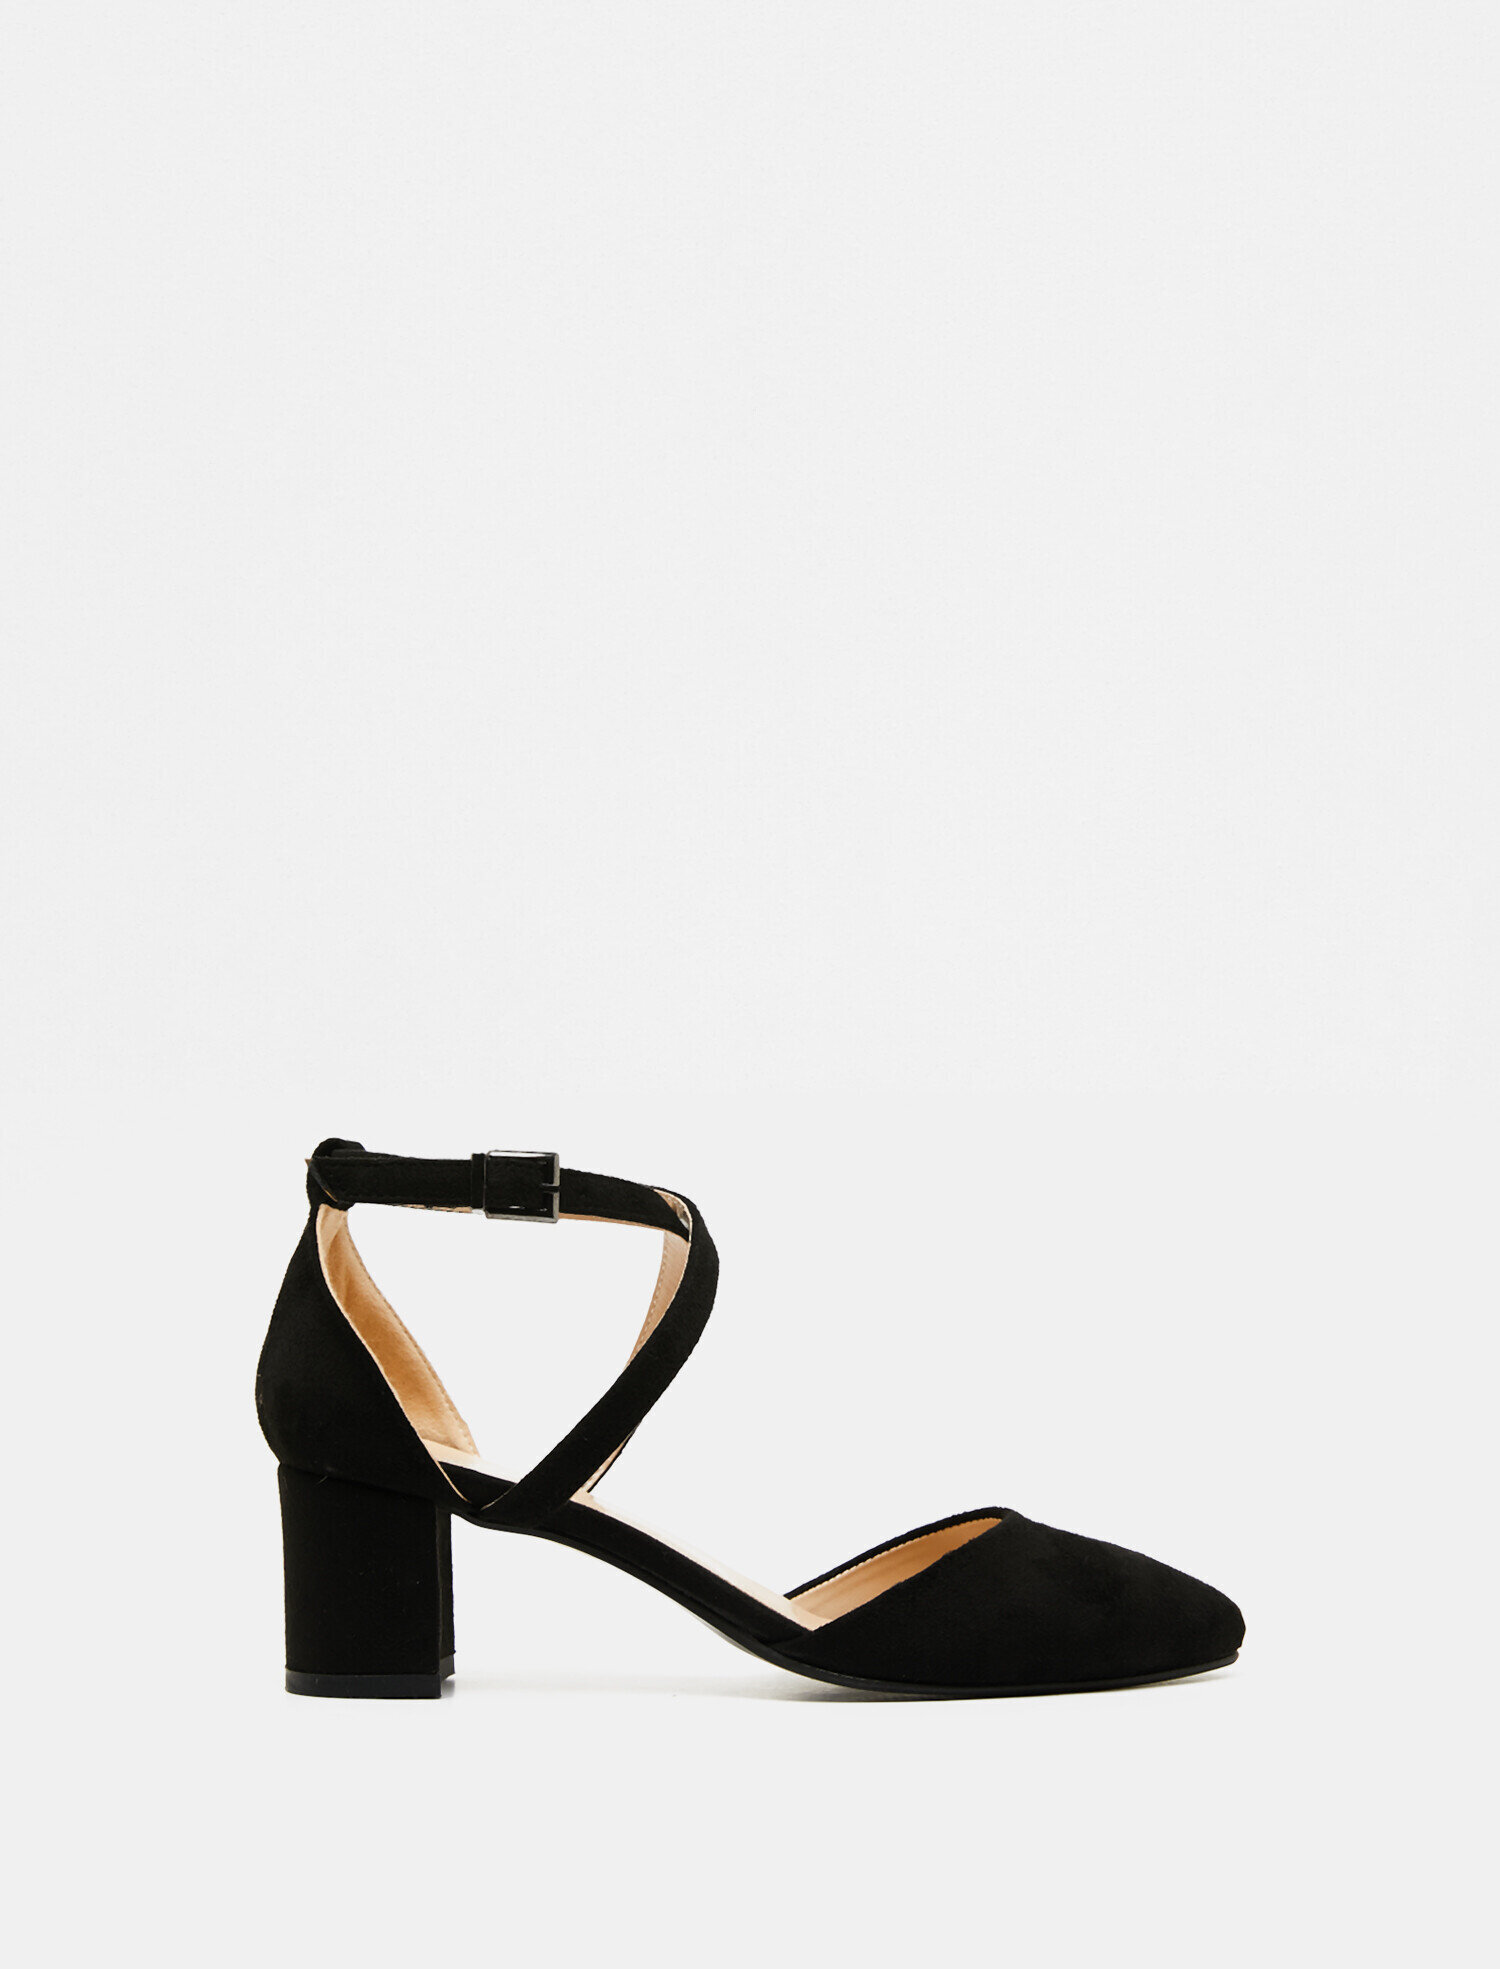 52549c0b73205 Siyah Bayan Toka Detaylı Topuklu Ayakkabı 9YAK27001AA999   Koton